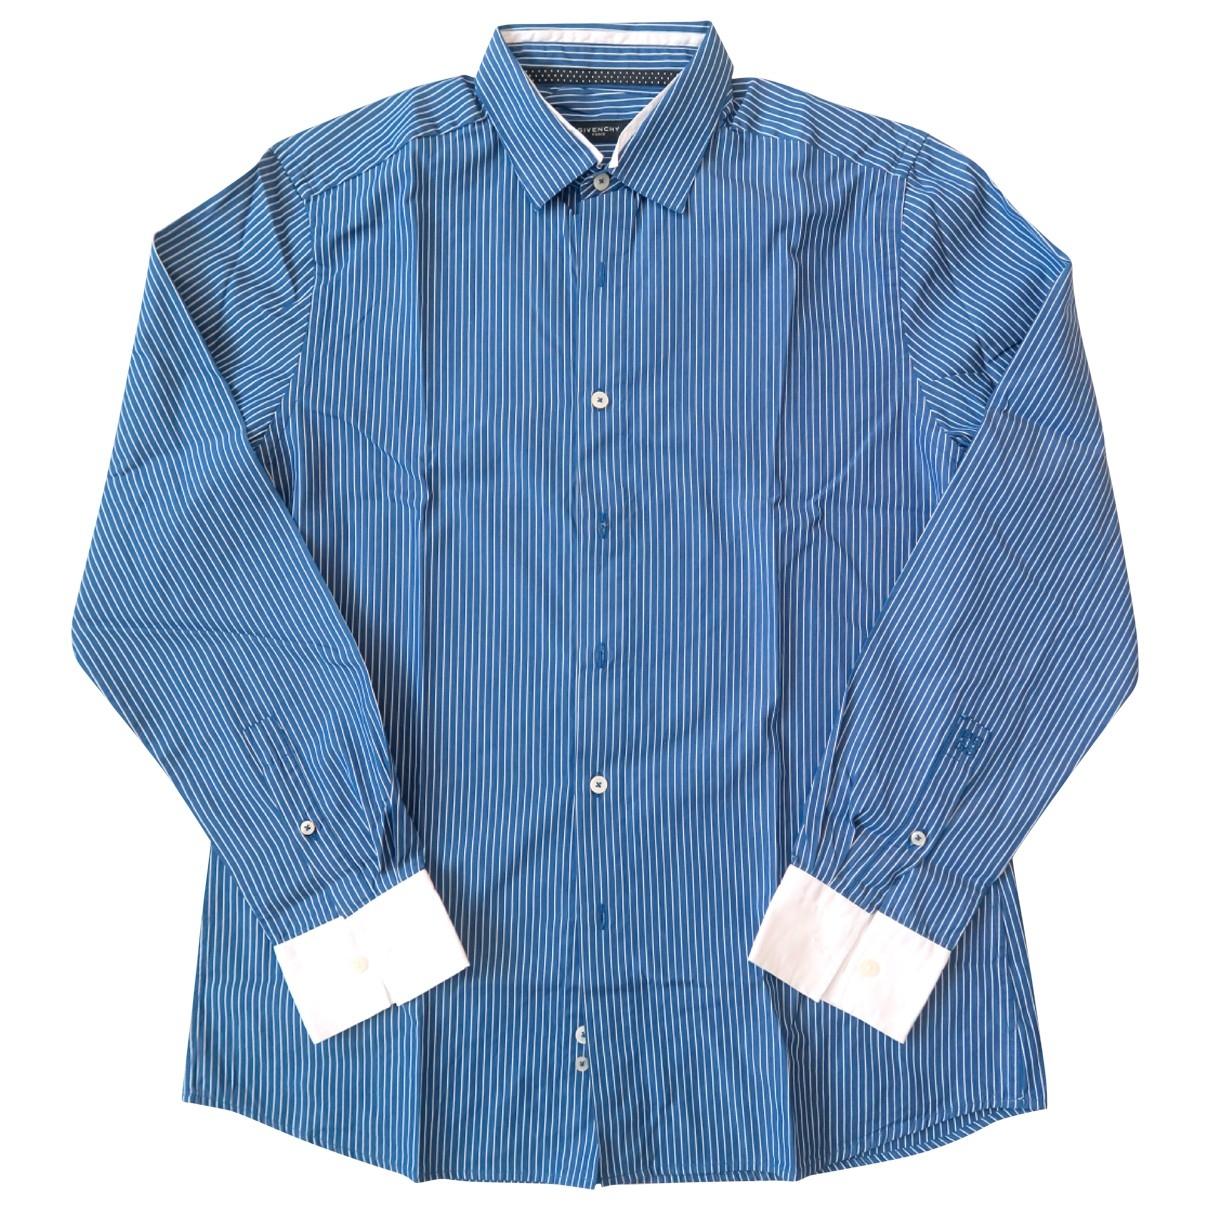 Givenchy \N Hemden in  Blau Baumwolle